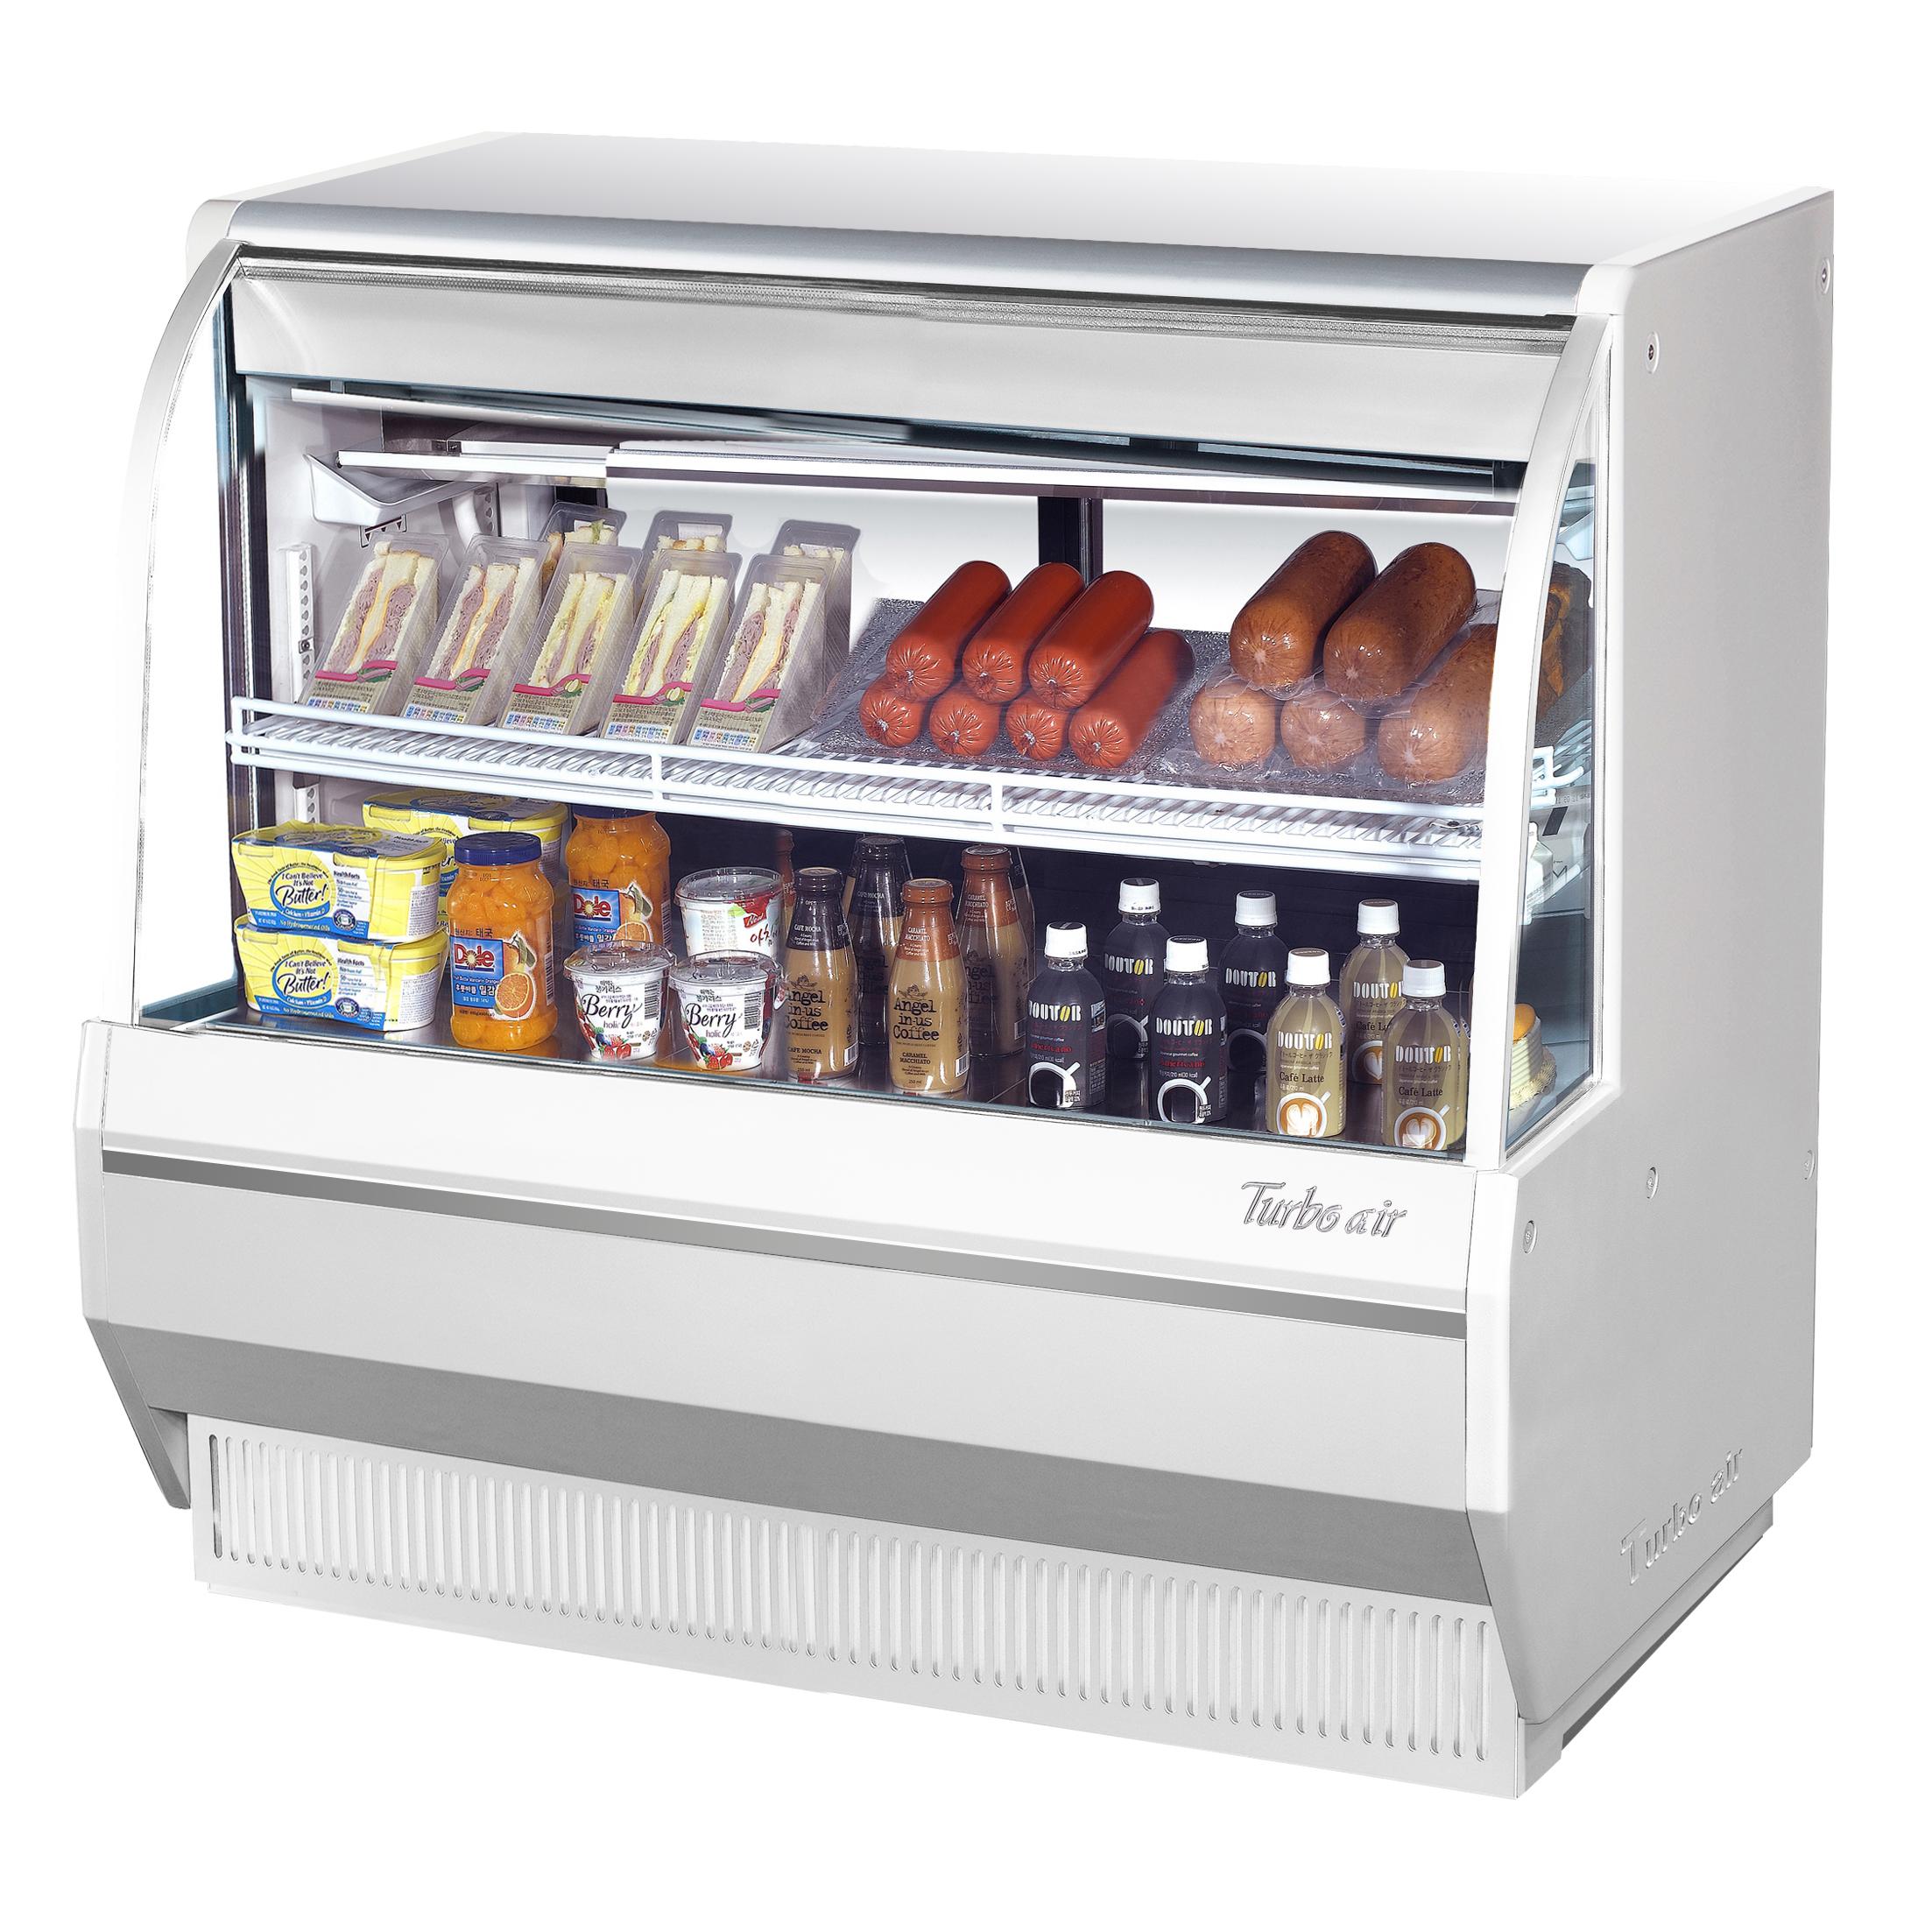 Turbo Air TCDD-48L-W(B)-N display case, refrigerated deli